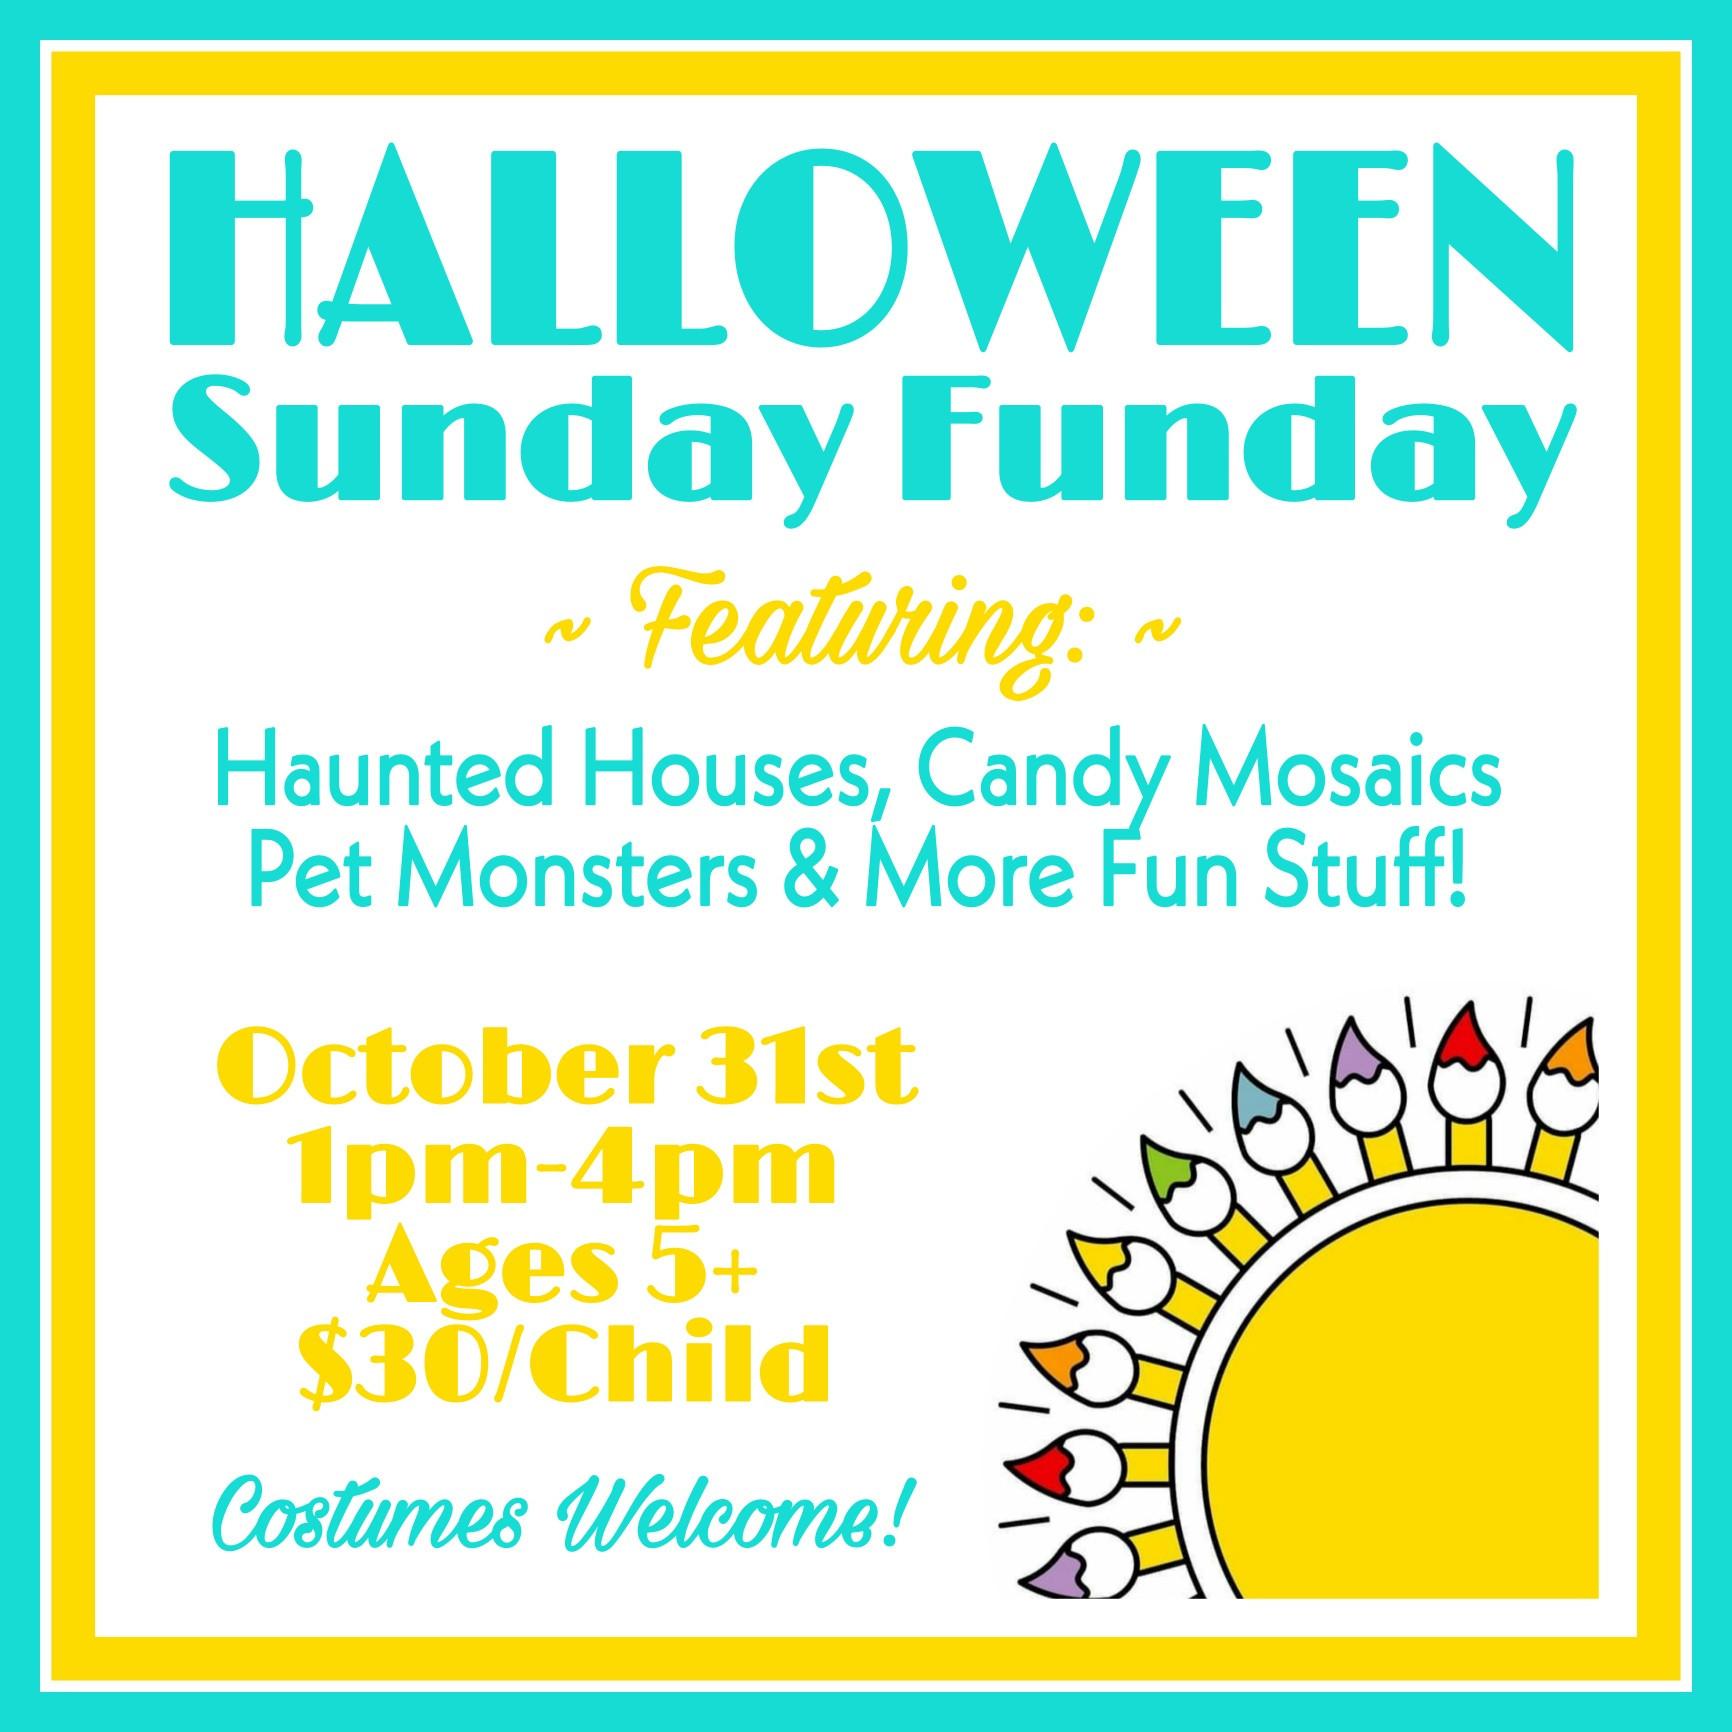 Halloween Sunday Funday